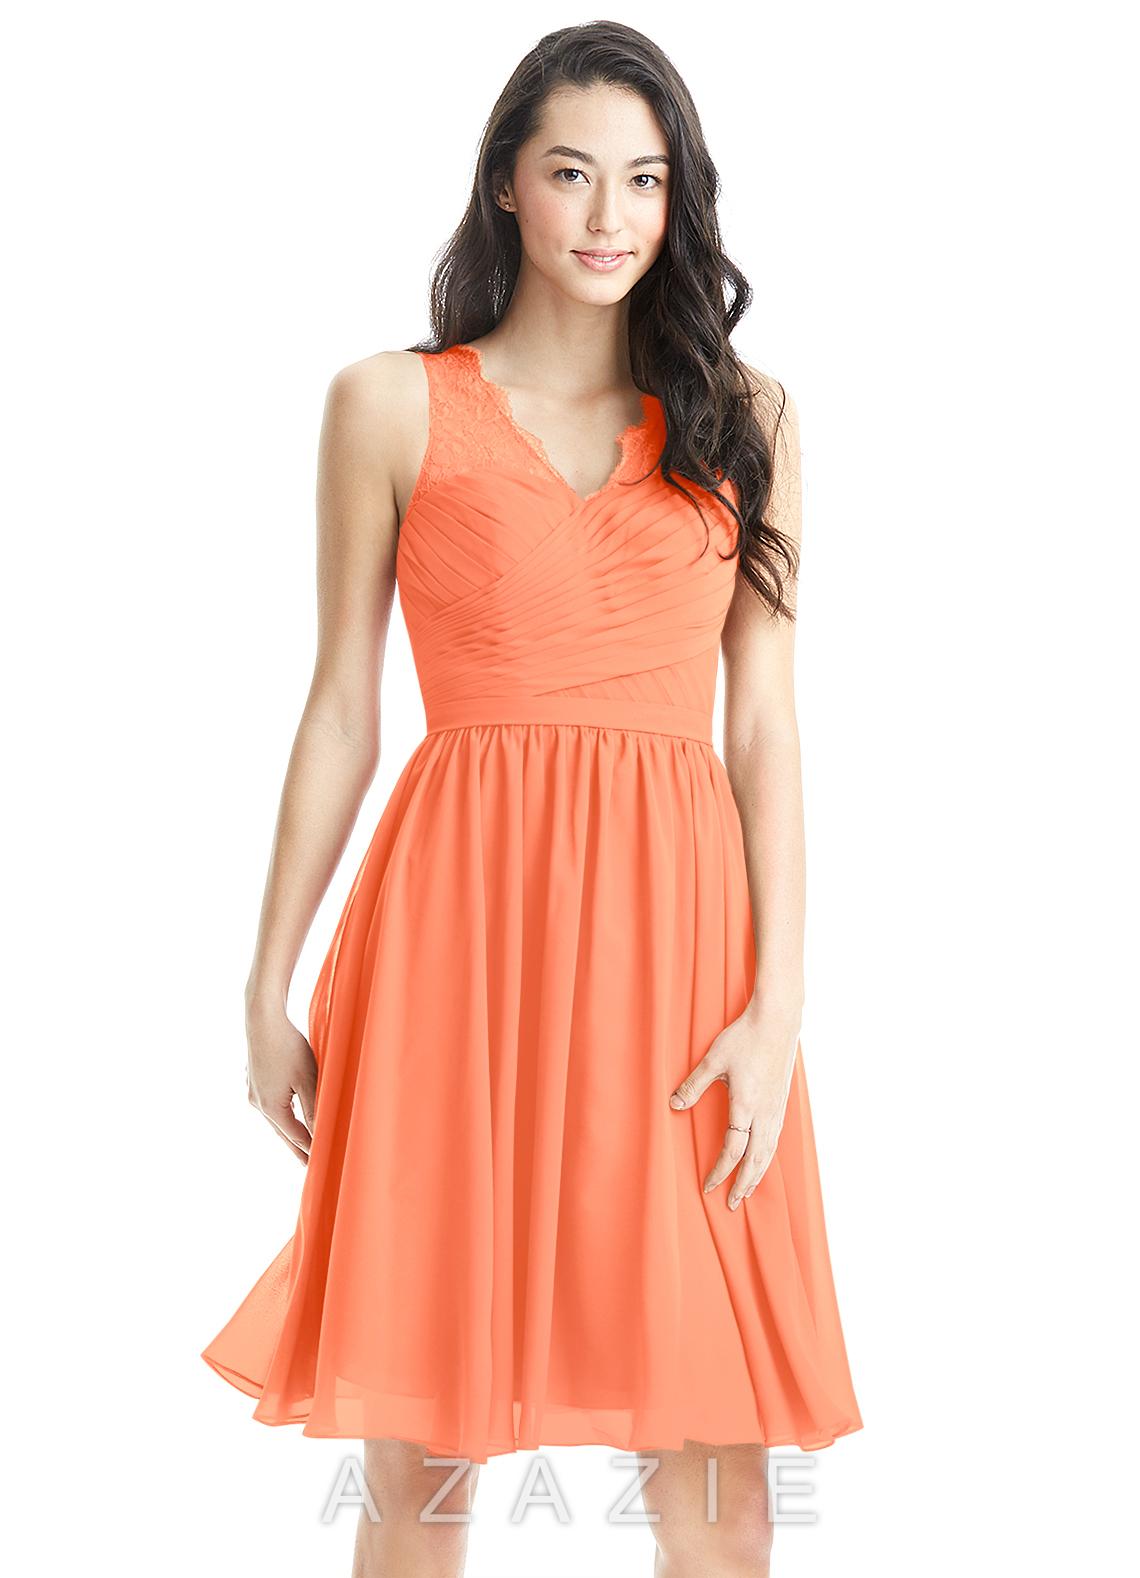 2c6ca8654c8e8 Azazie Heloise Bridesmaid Dress | Azazie